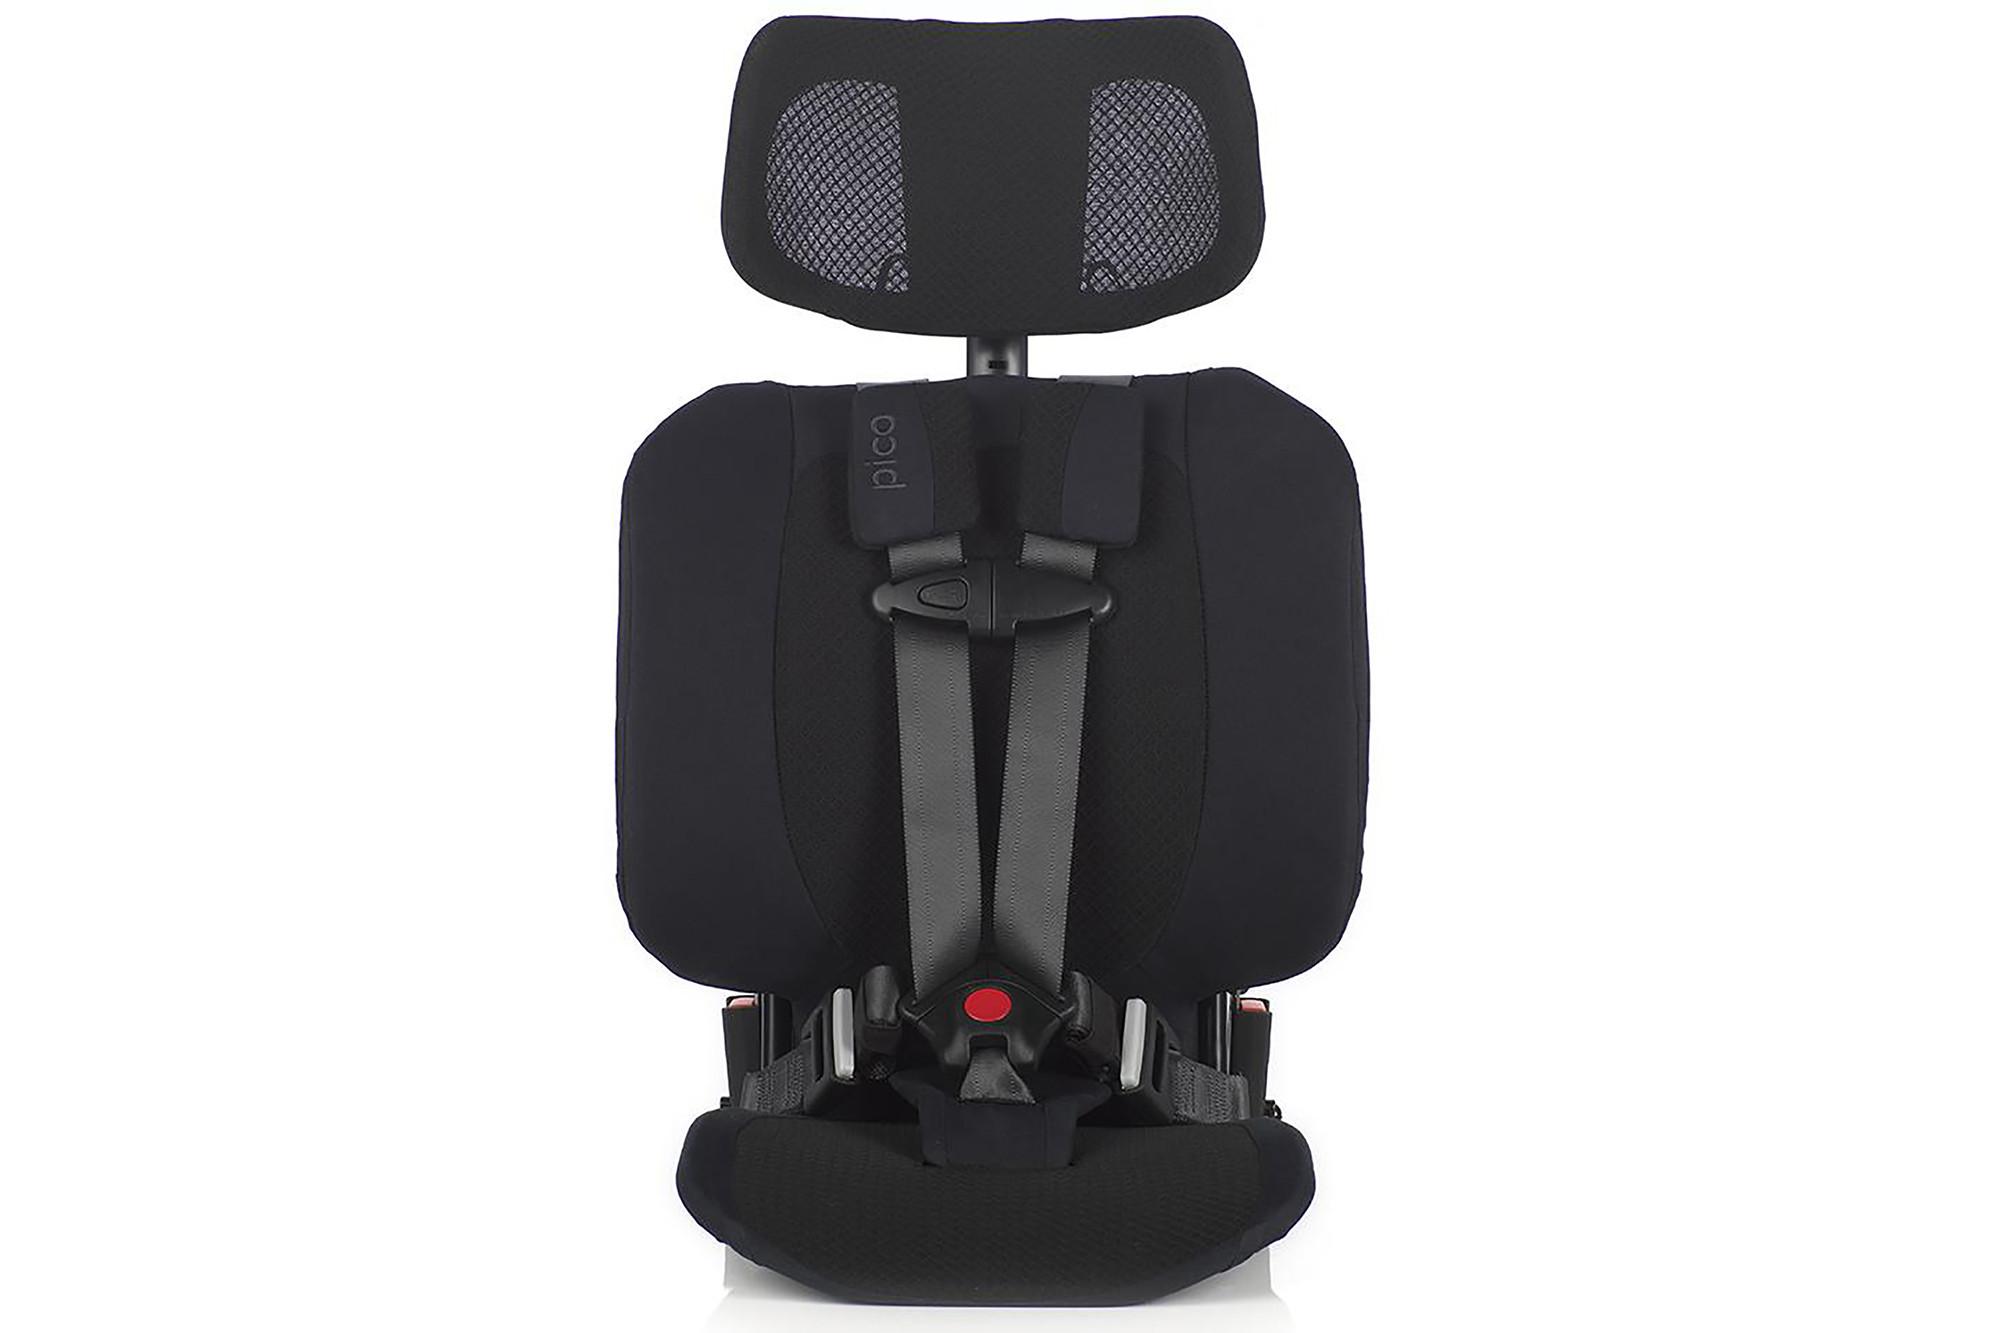 Wayb Pico Car Seat: Recall Alert